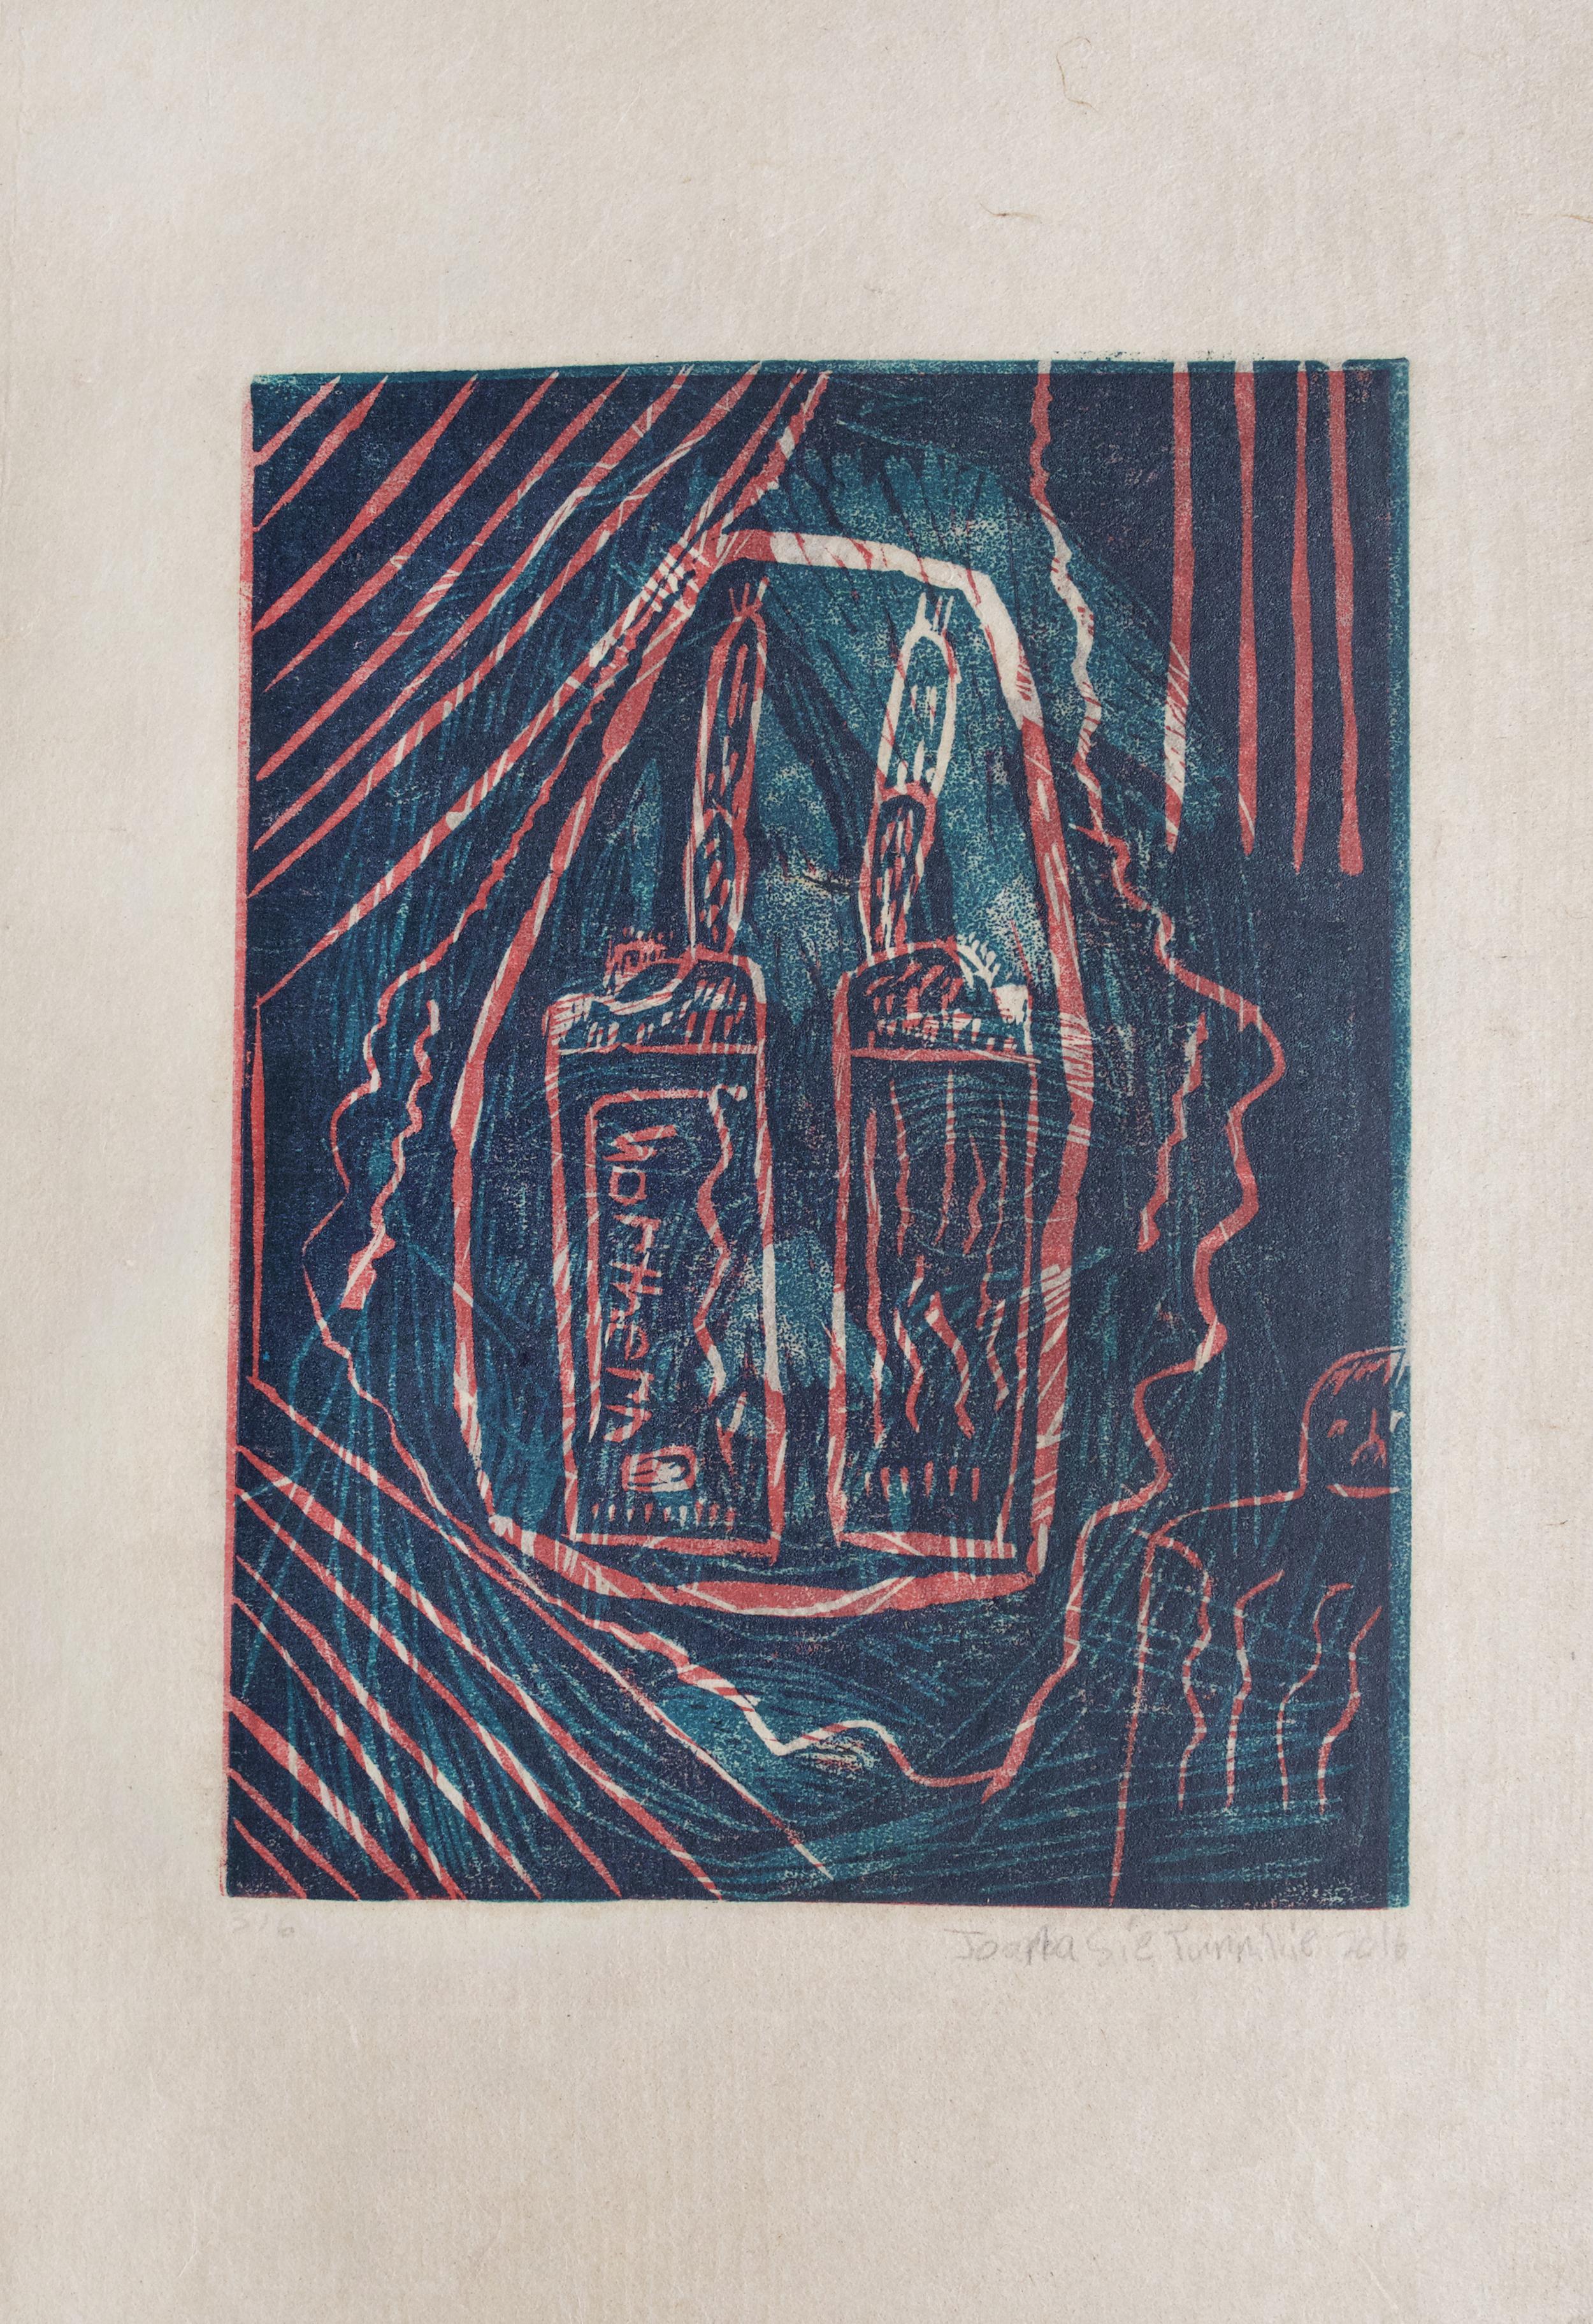 "Lighters   Joanasie Tunnillie  Two-Layer Linocut Print on Washi  15.5 x 21.5"""